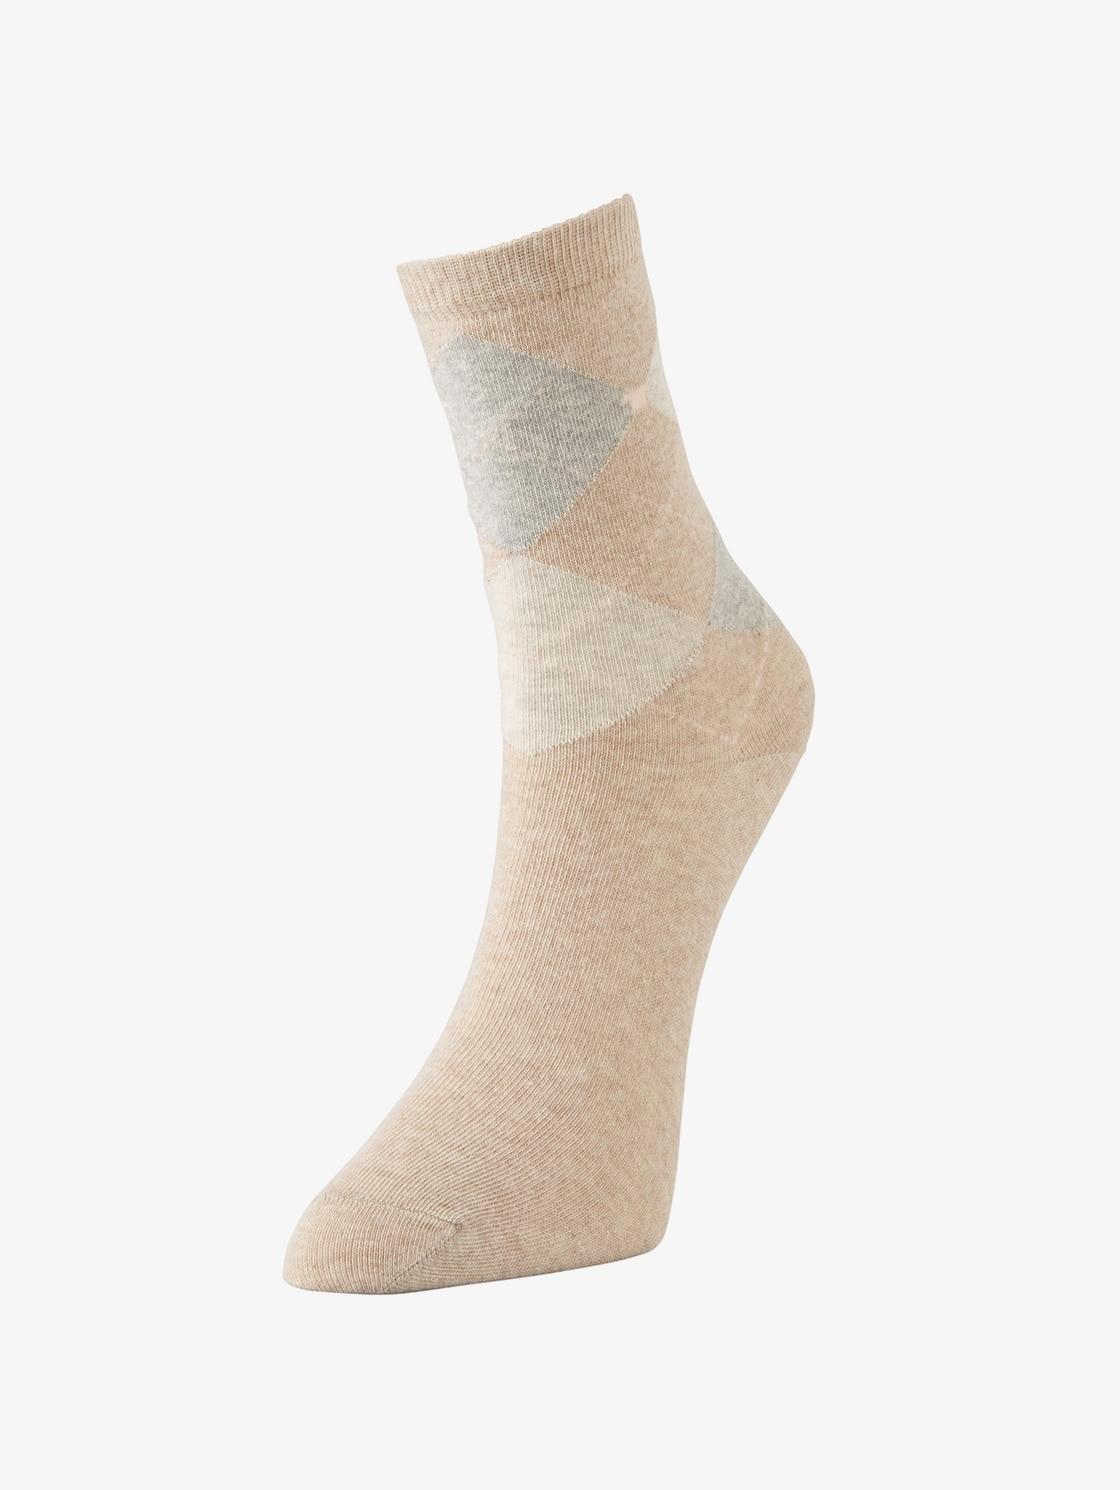 Tom Tailor Casual Socken im Doppelpack, Damen, beige, Größe: 35 38